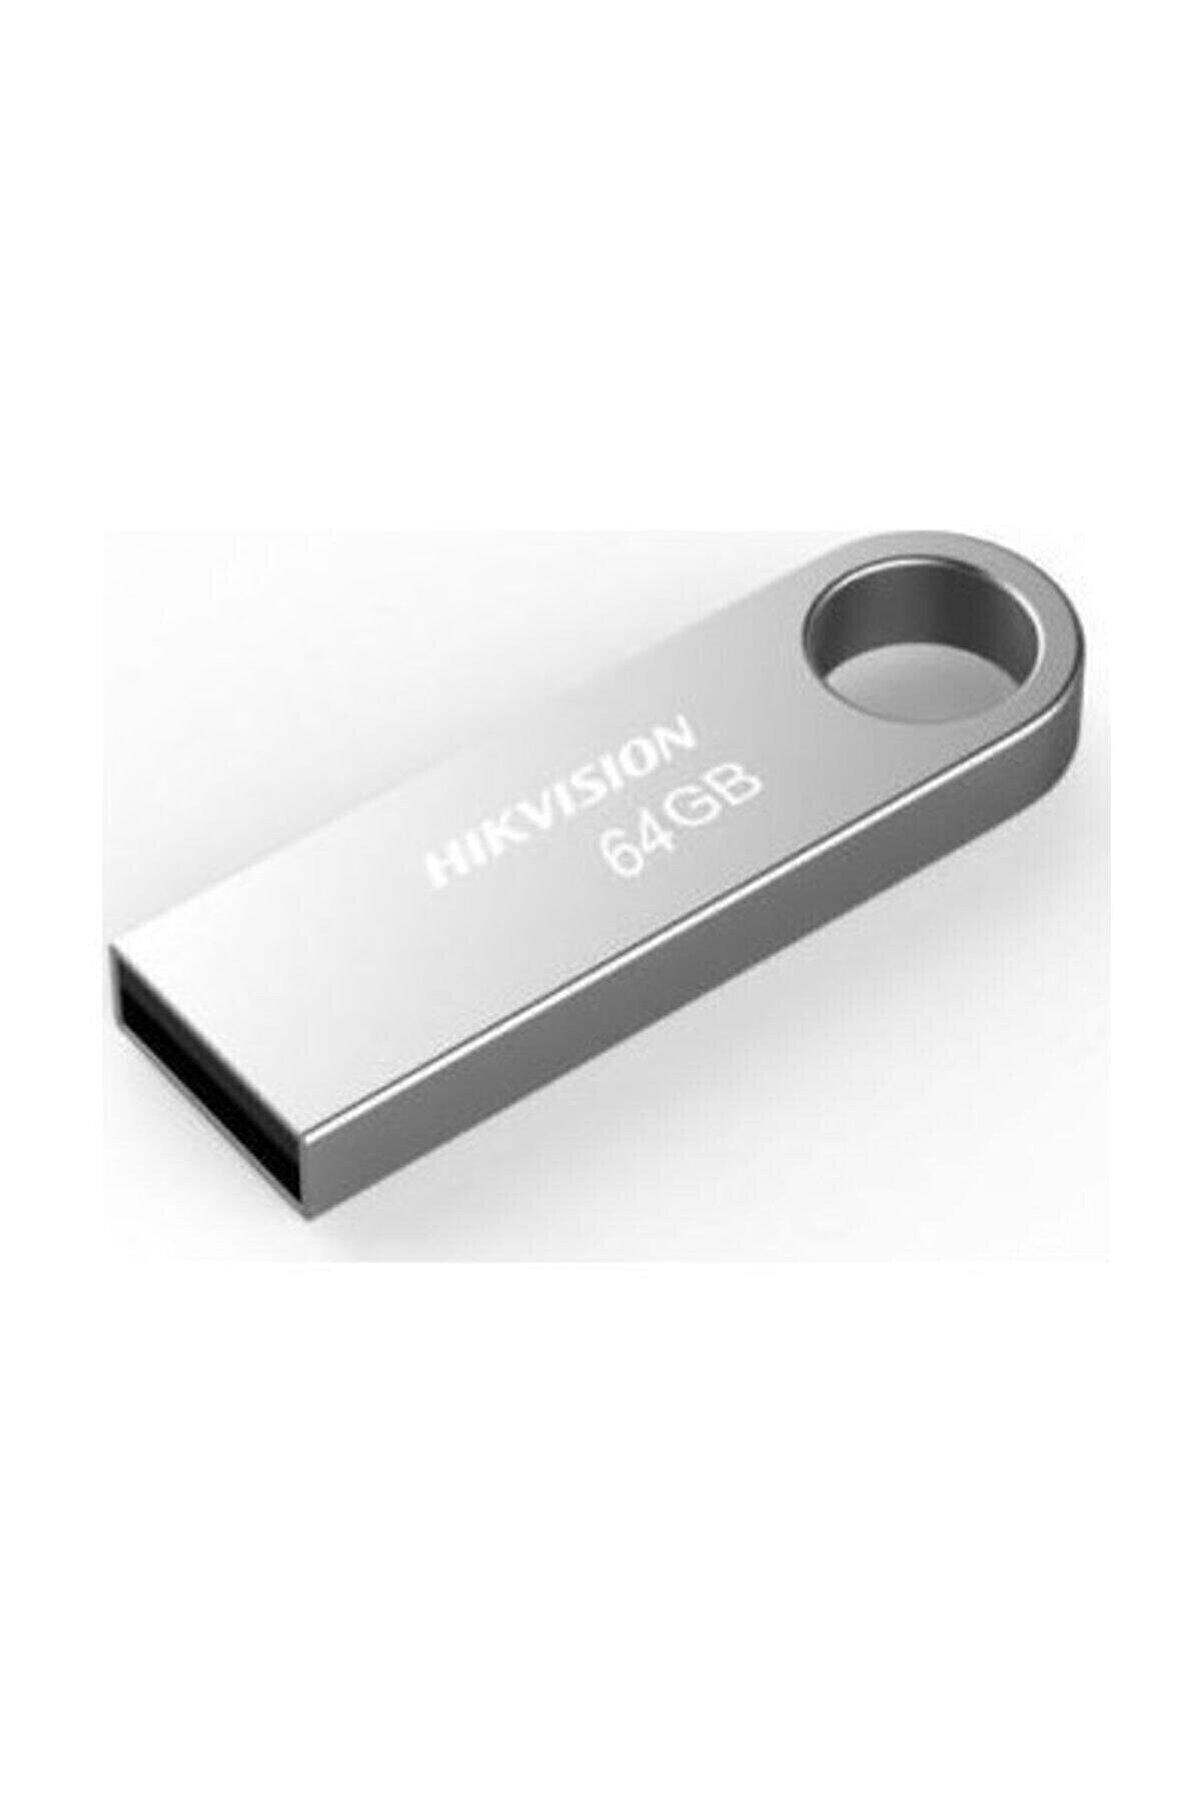 Hikvision Güncel Versiyon 64 Gb Usb 2.0 Bellek